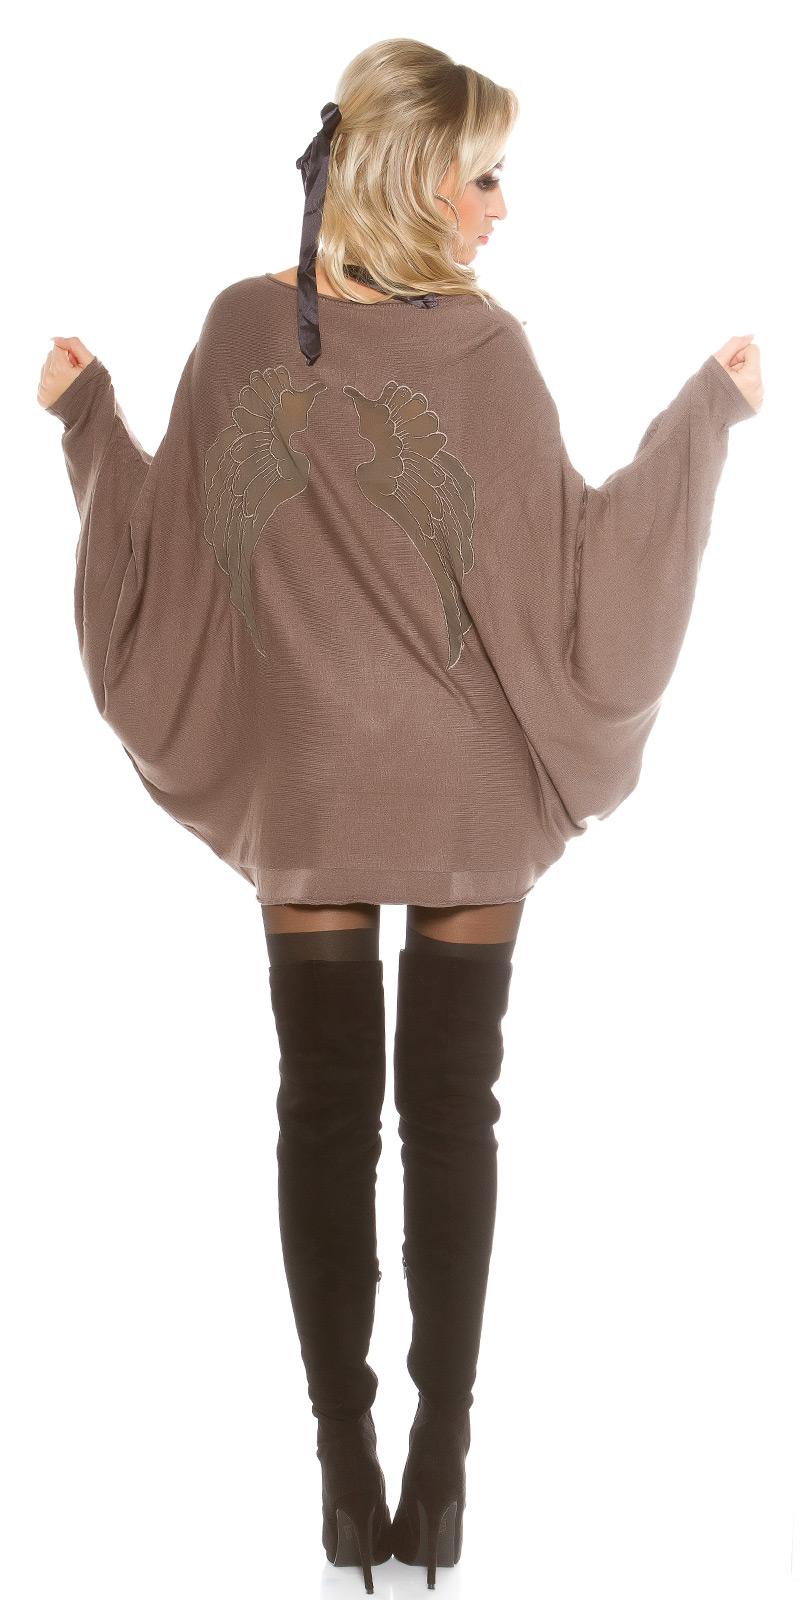 Pulovere la moda supradimensionat bat AngelWings